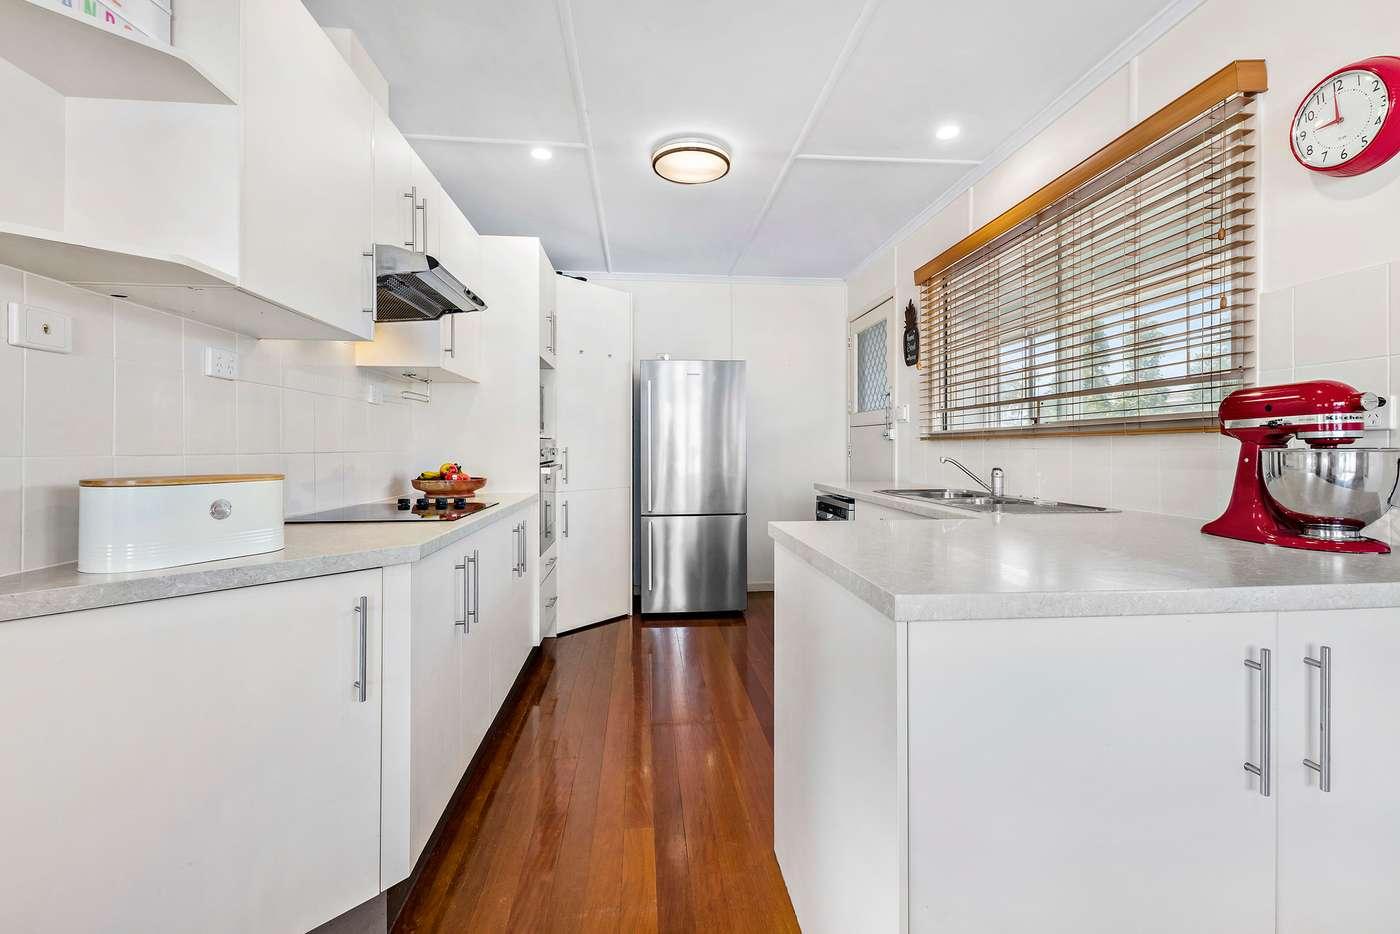 Sixth view of Homely house listing, 68 Hamilton Street, Tingalpa QLD 4173